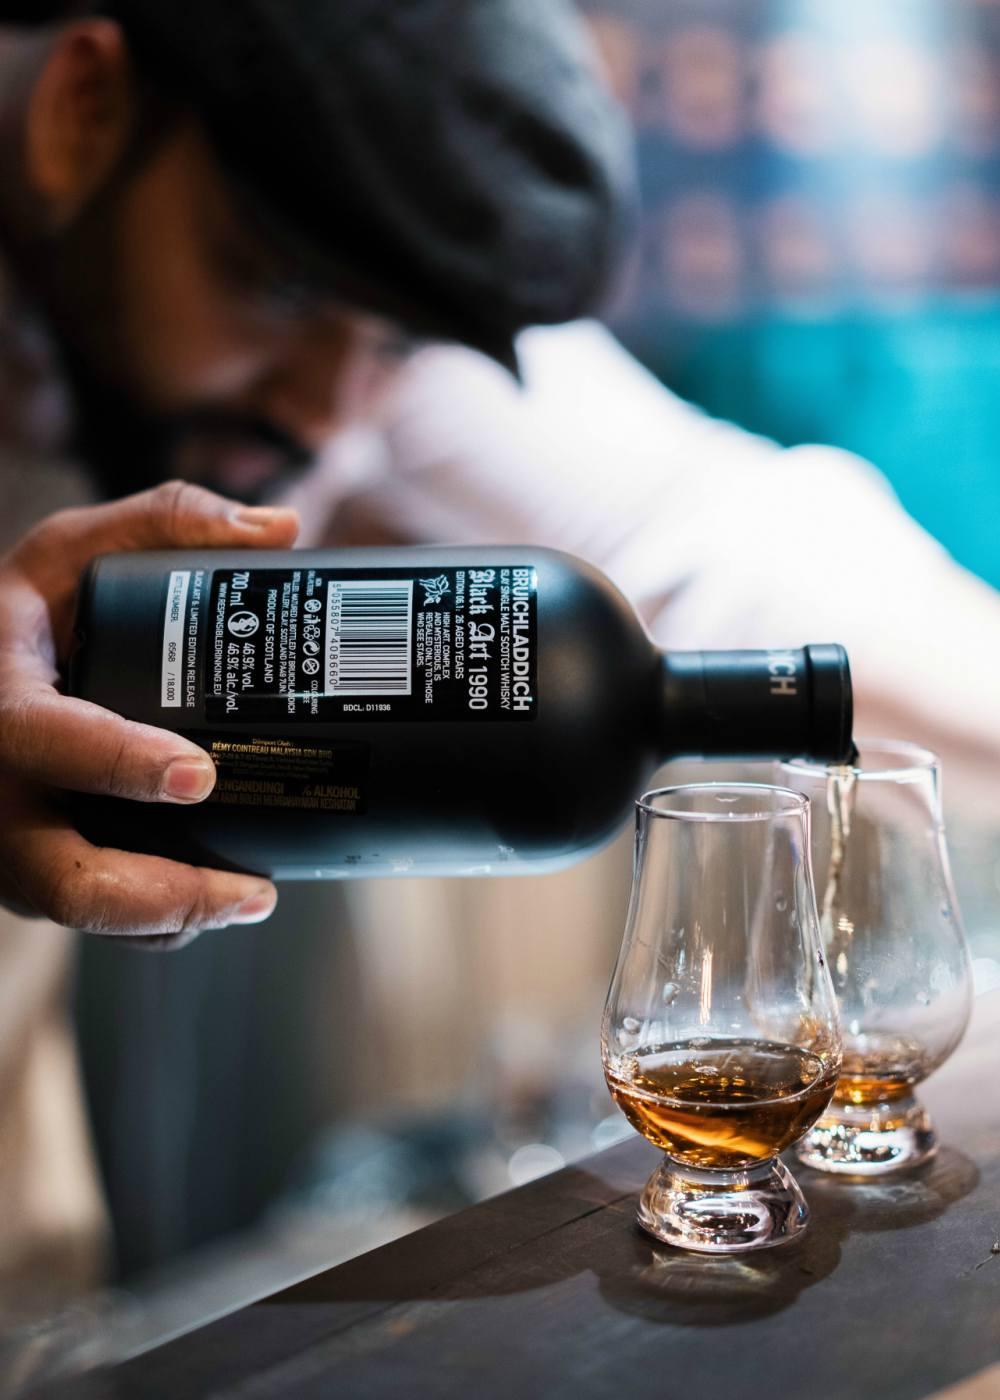 Filing Bruichladdich Black Art 06.1 Scotch Whisky - Bruichladdich Black Art Edition 06.1:麦芽威士忌的神秘星图